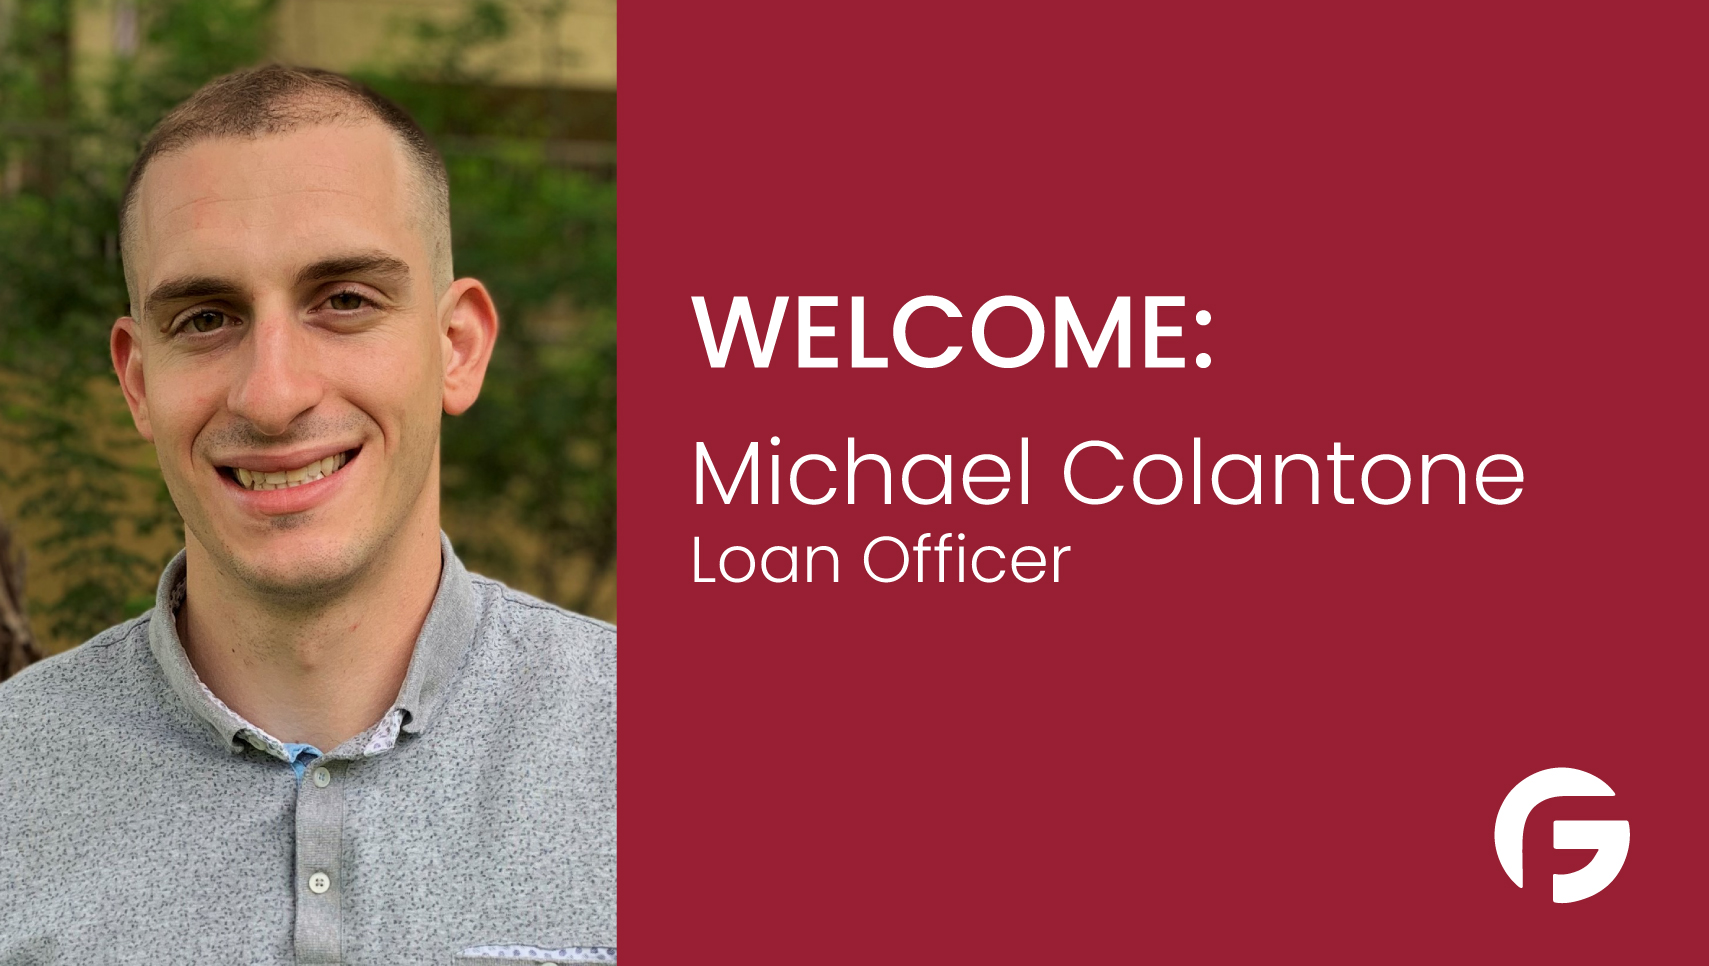 Michael Colantone Loan Officer serving AZ, AR, CA, FL, IN, LA, MI, MN, NJ, NM, SC, TX, and WA